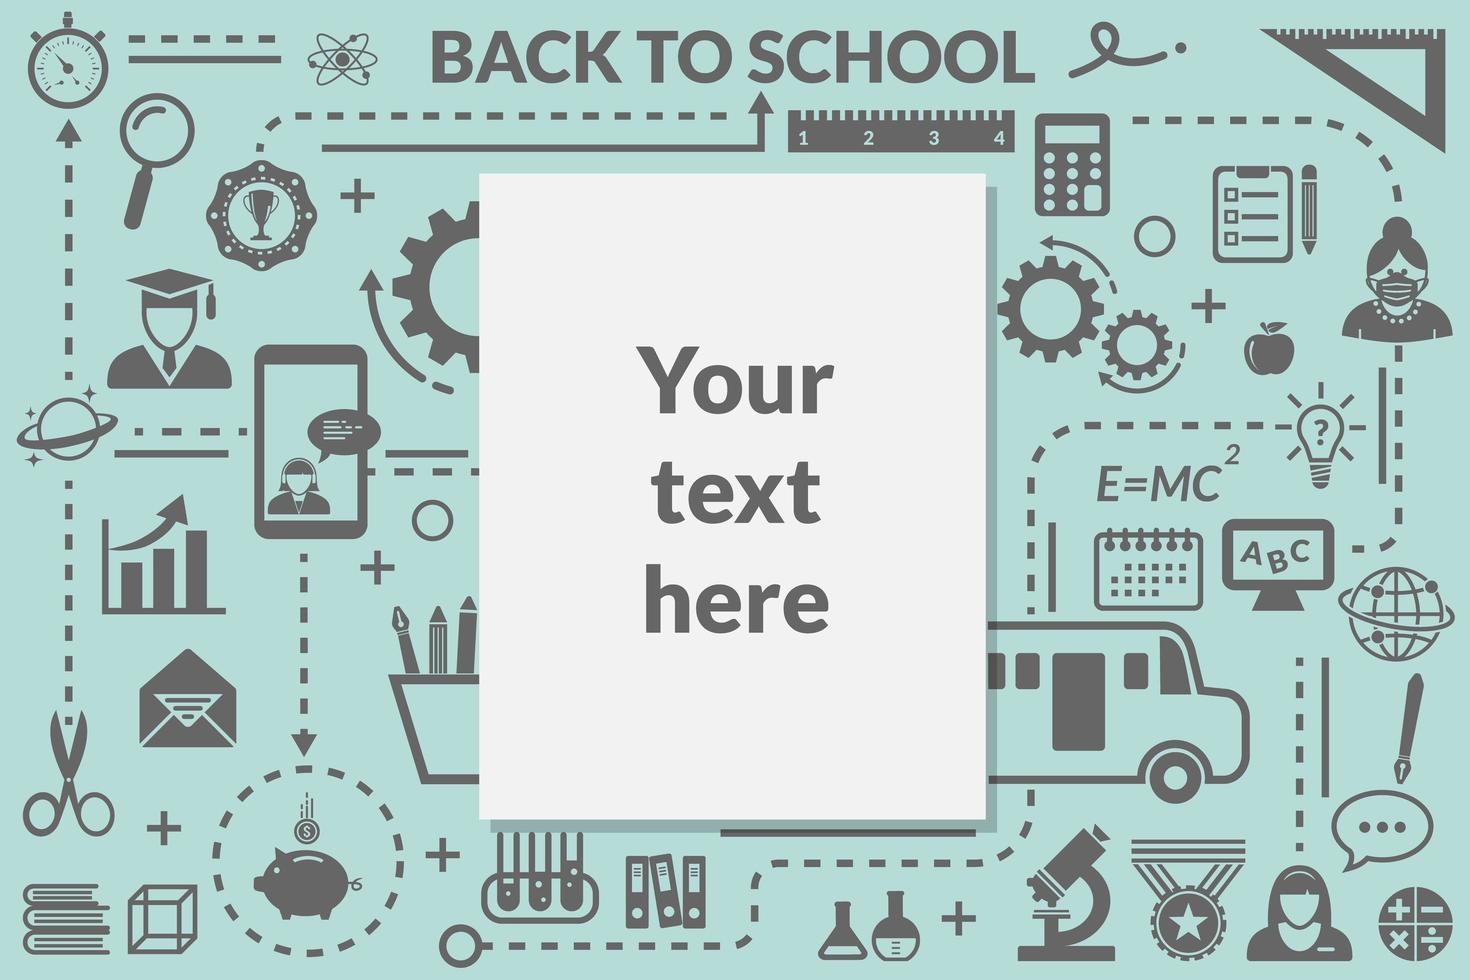 Back to school information board design  vector